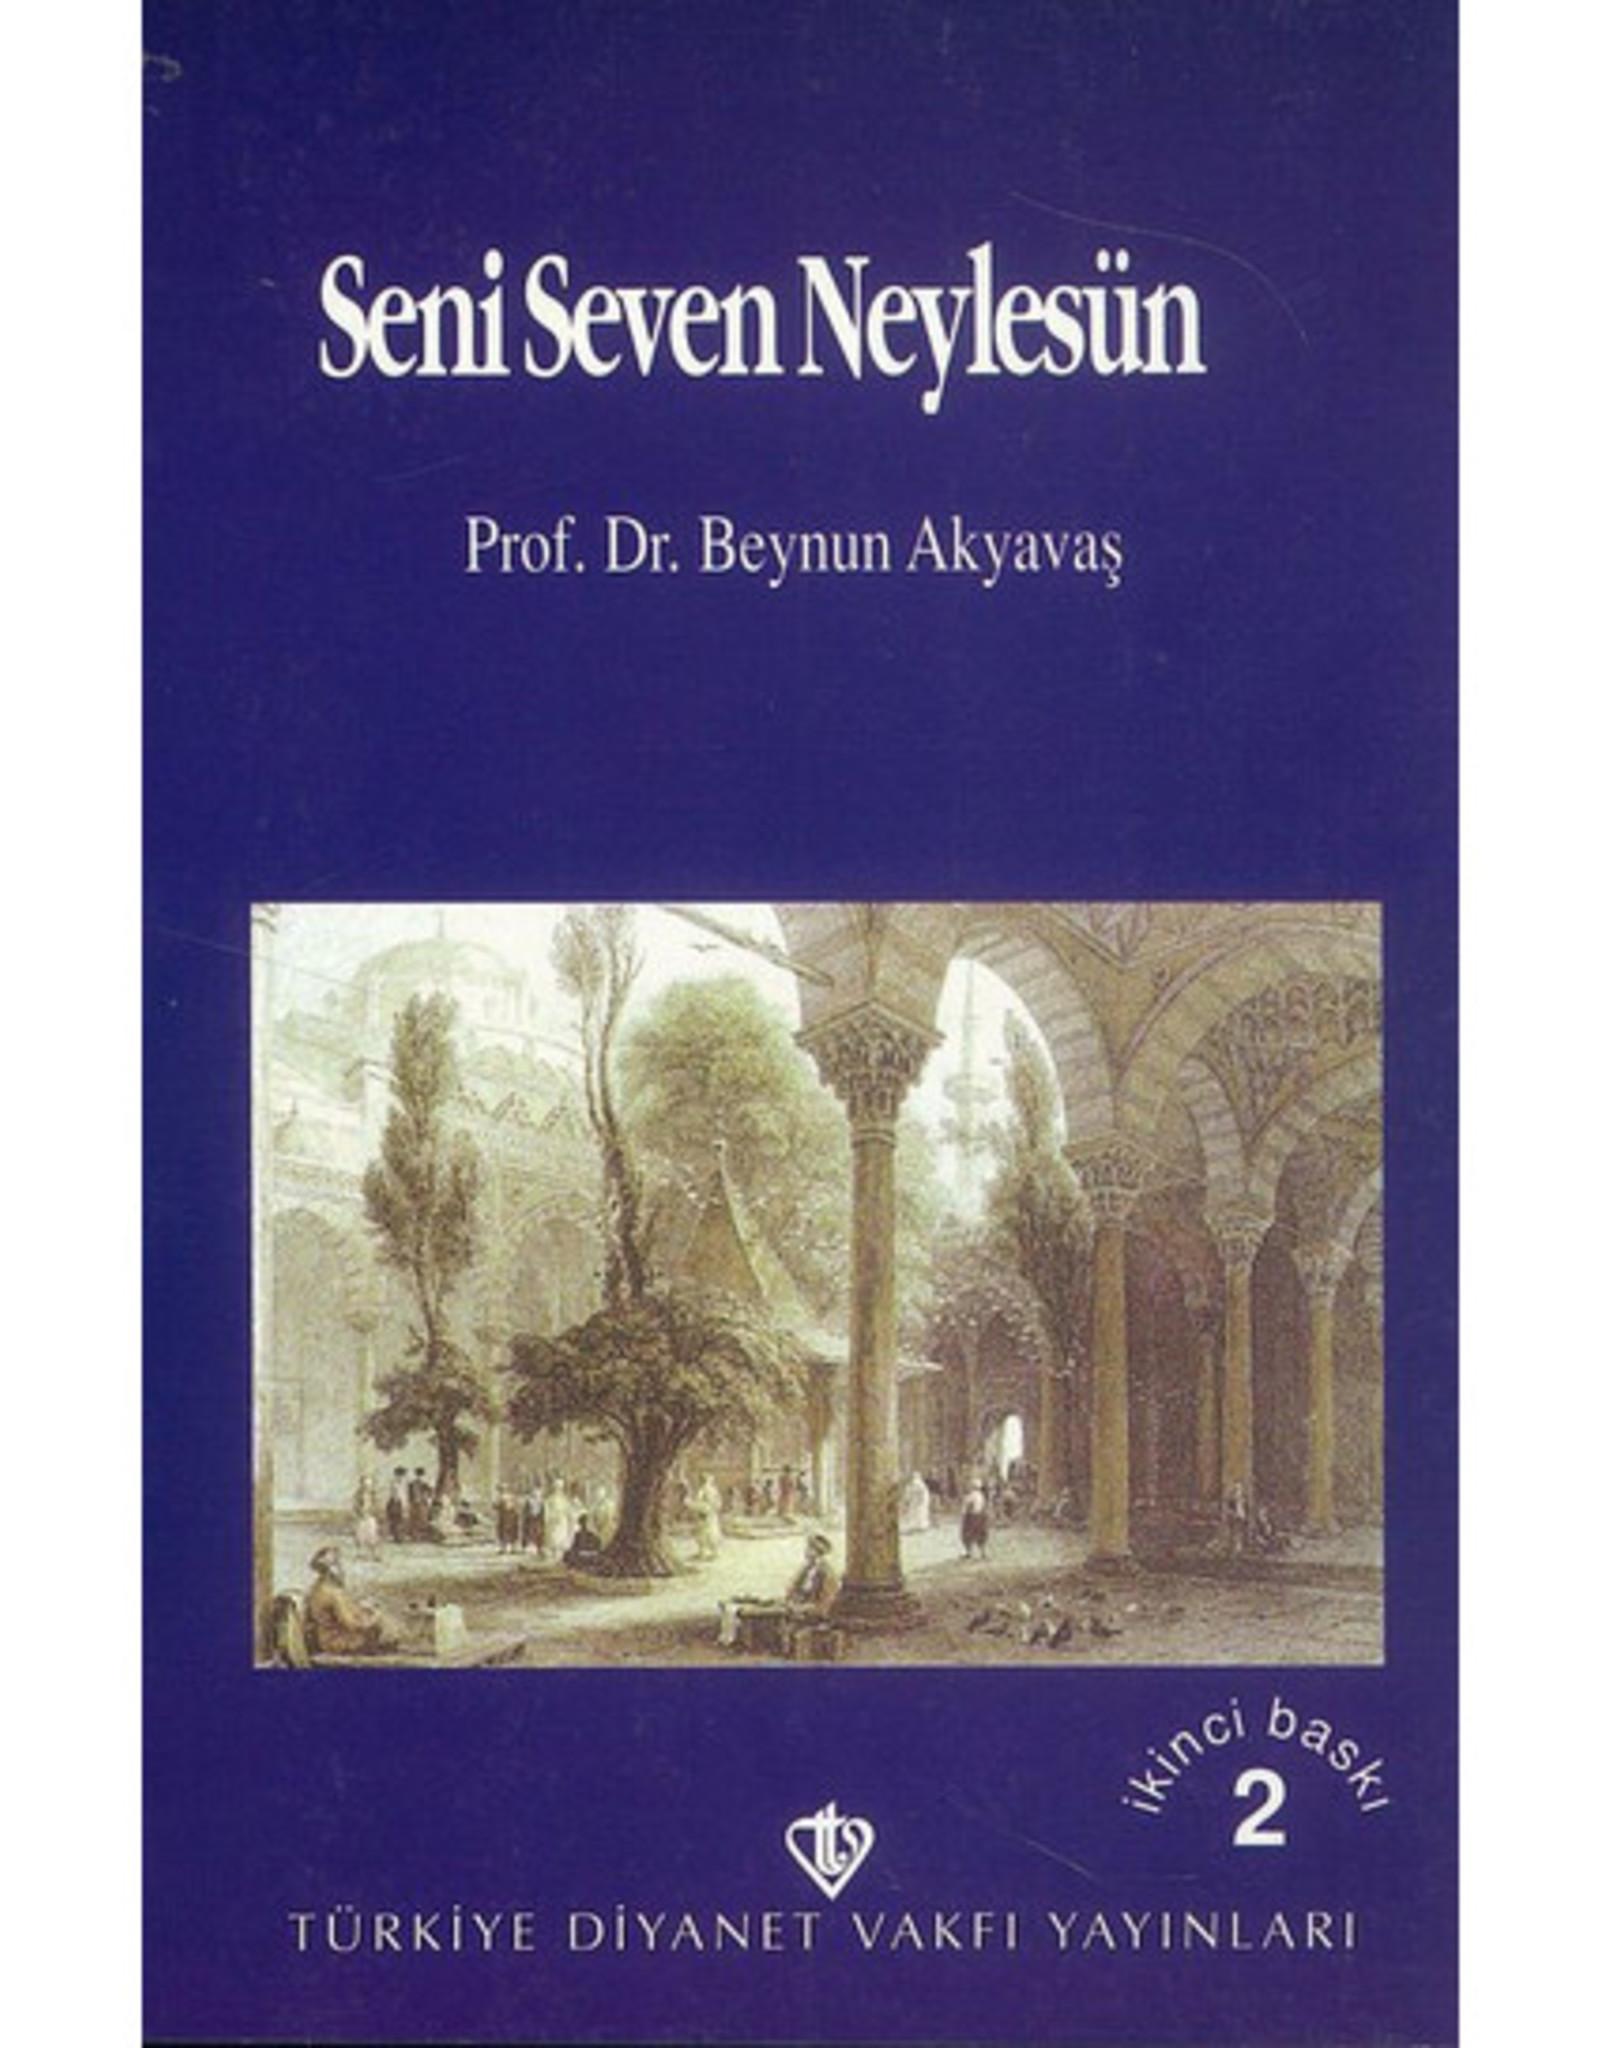 Seni Seven Neylesün